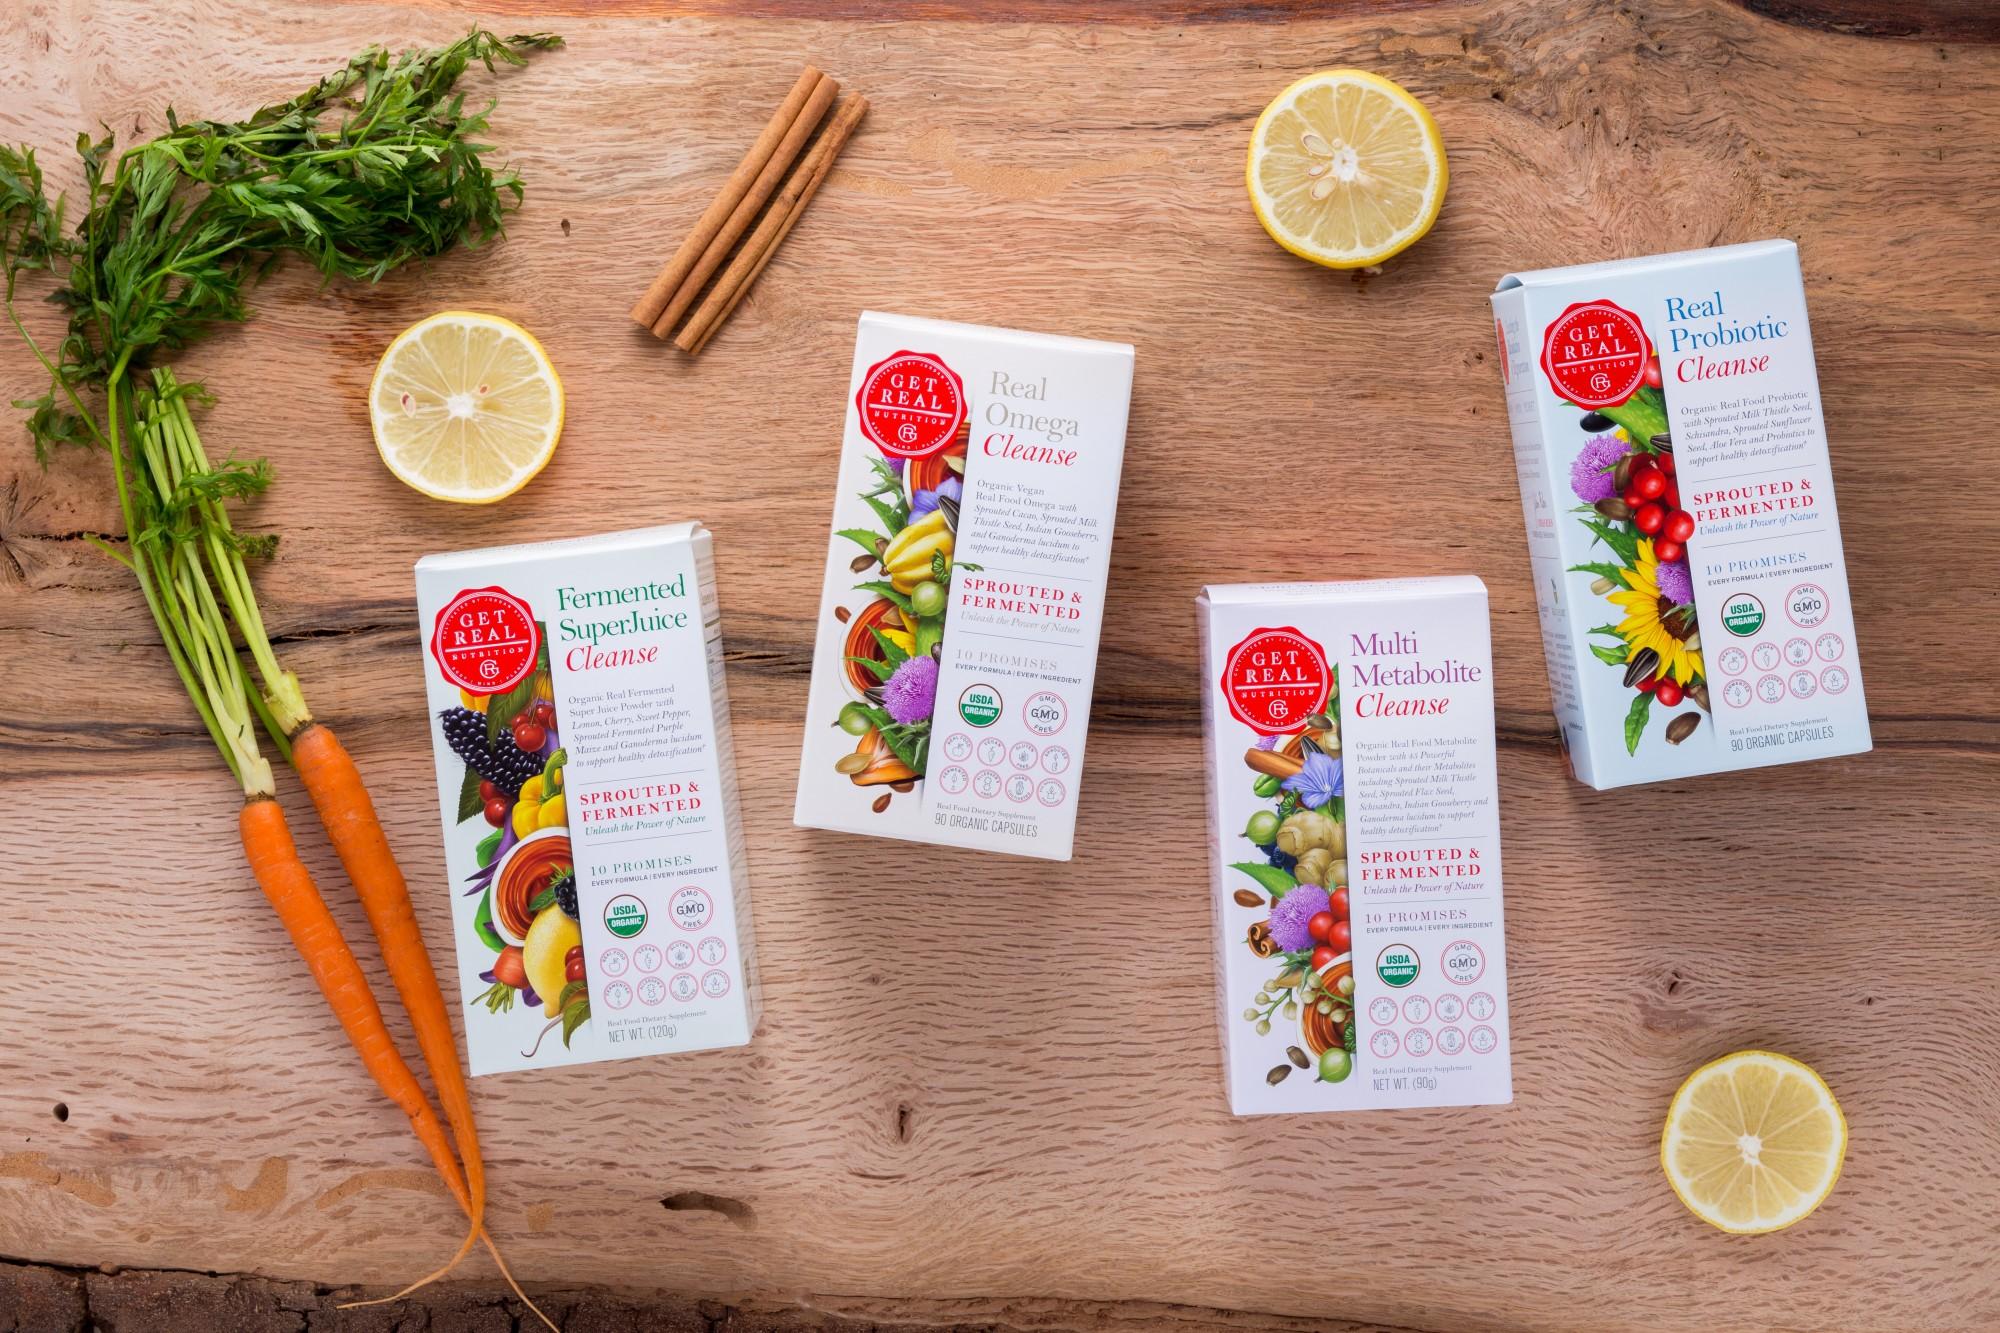 Move Over, Multivitamins—These Unique Supplements Deliver Nature's Nutrition